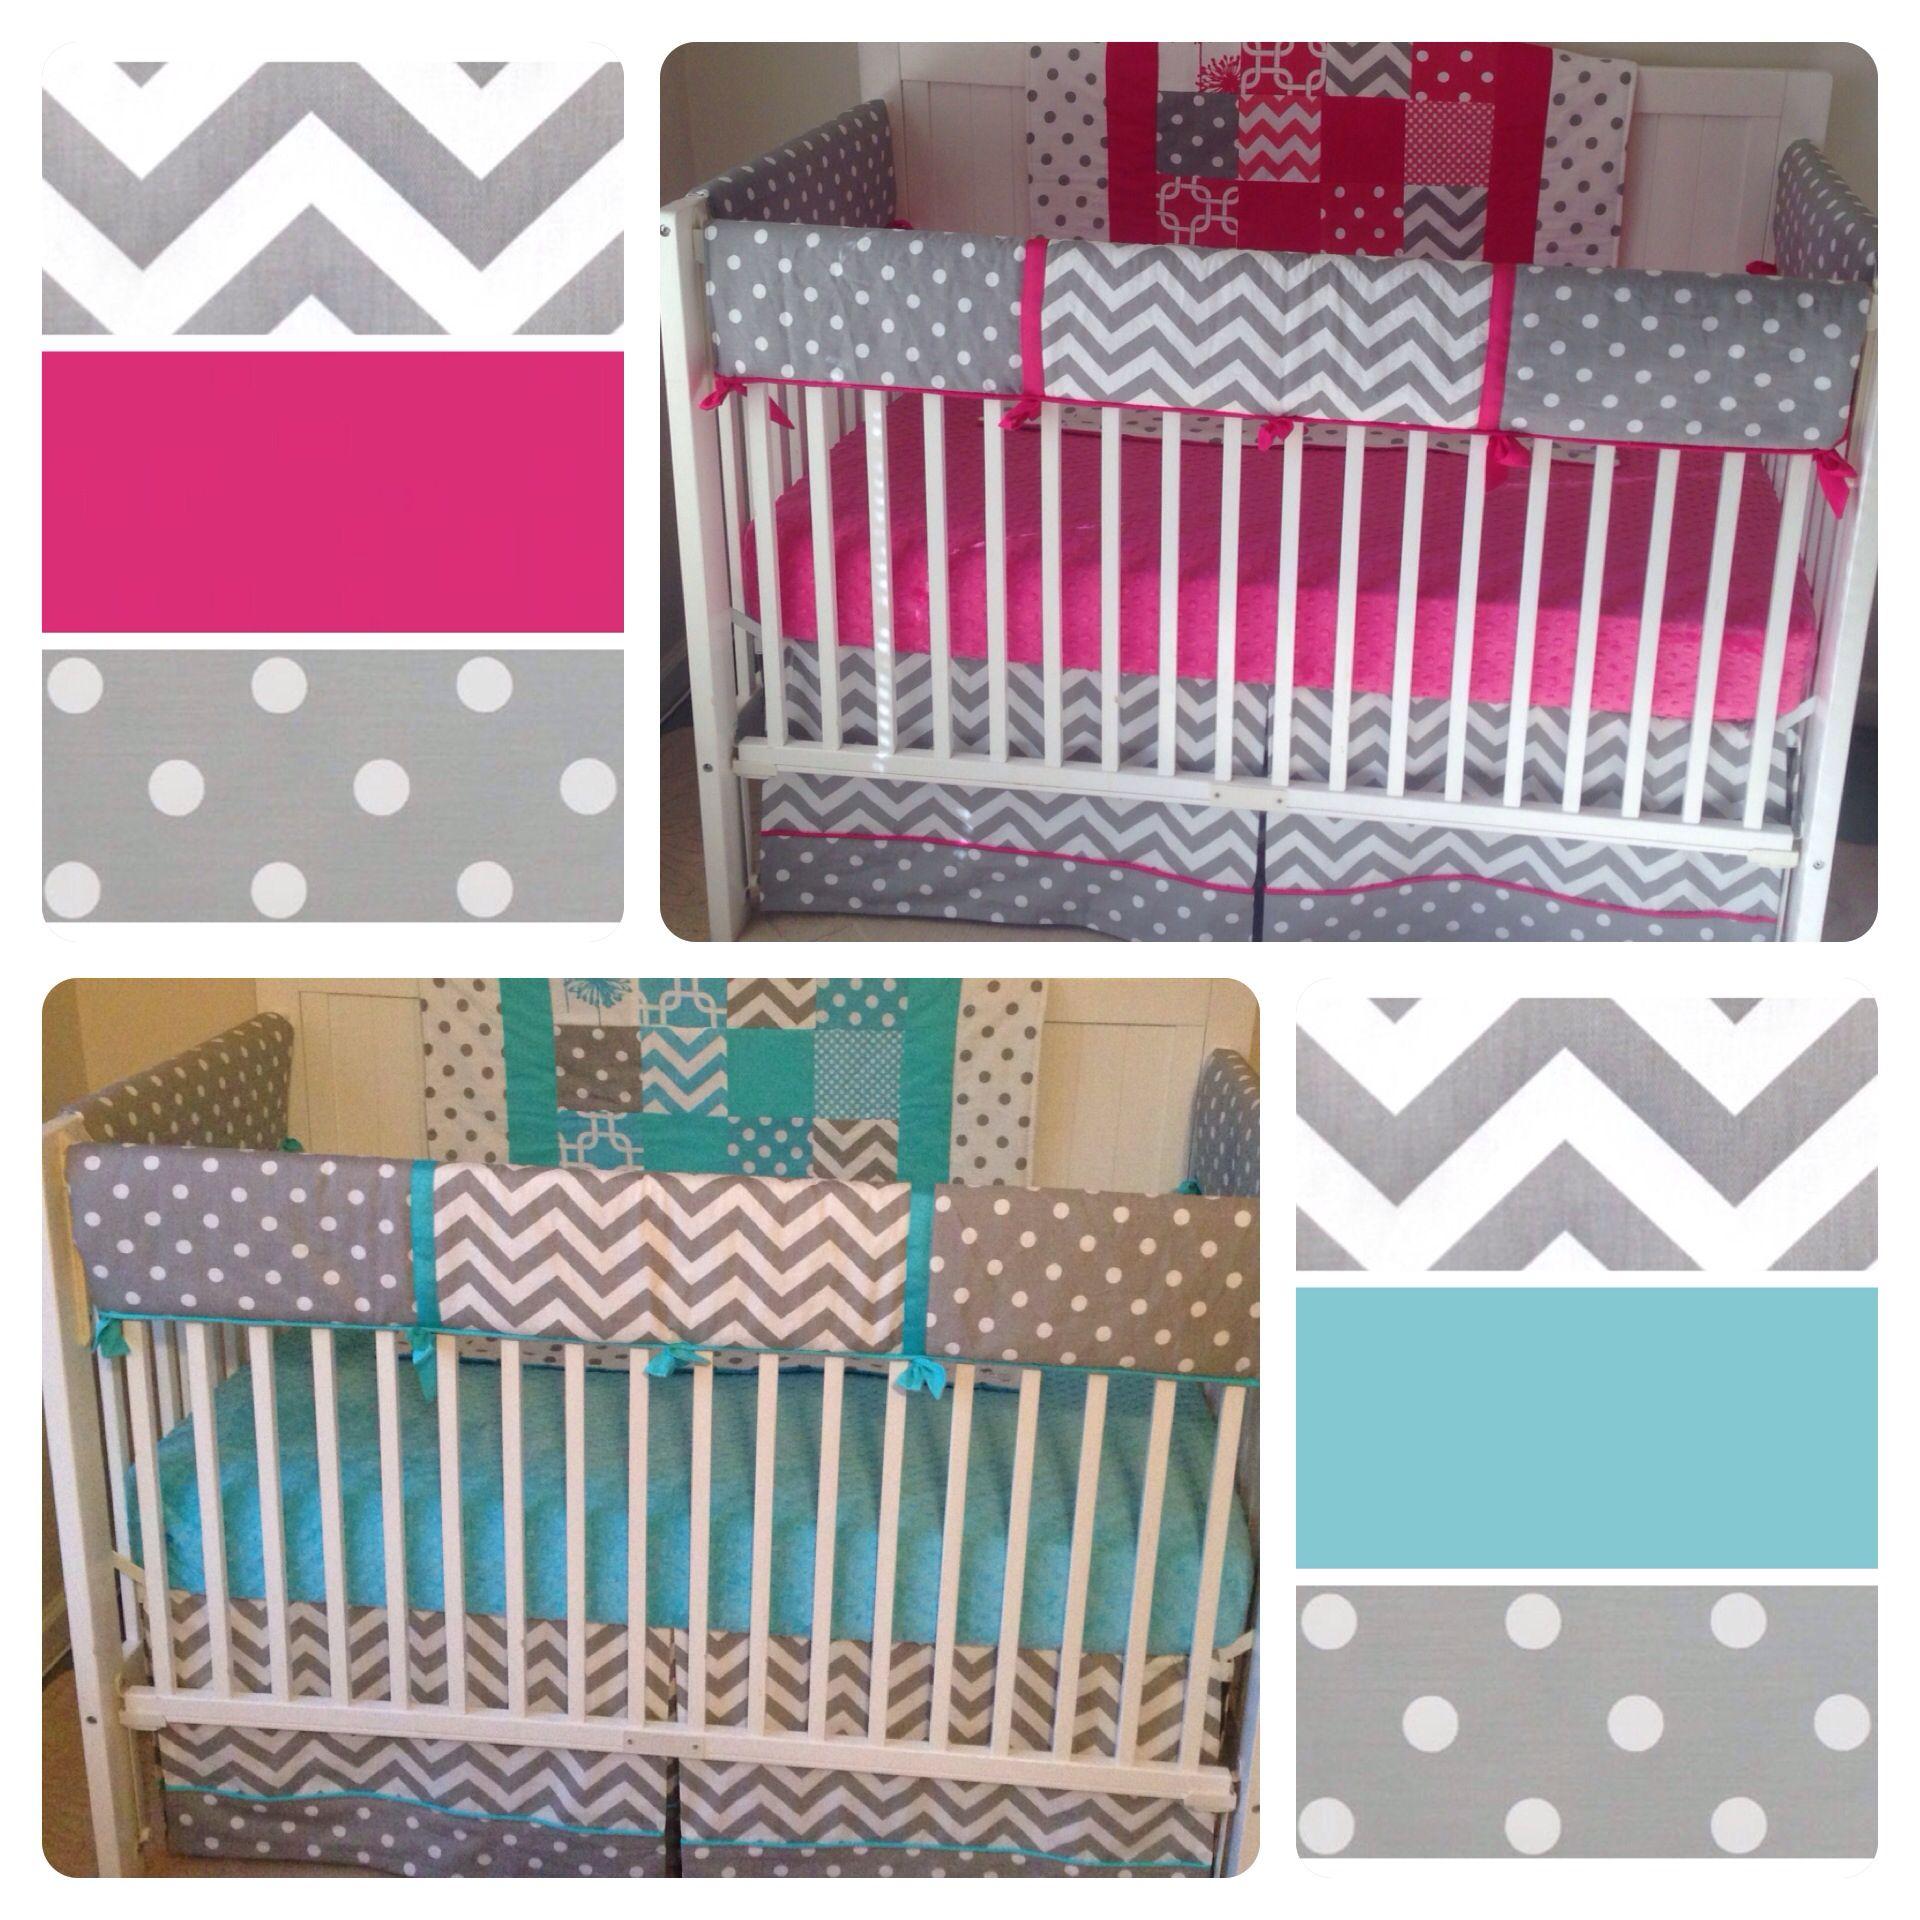 Aqua Teal And Fuchsia Hot Pink Boy Twin Crib Bedding Too Cute